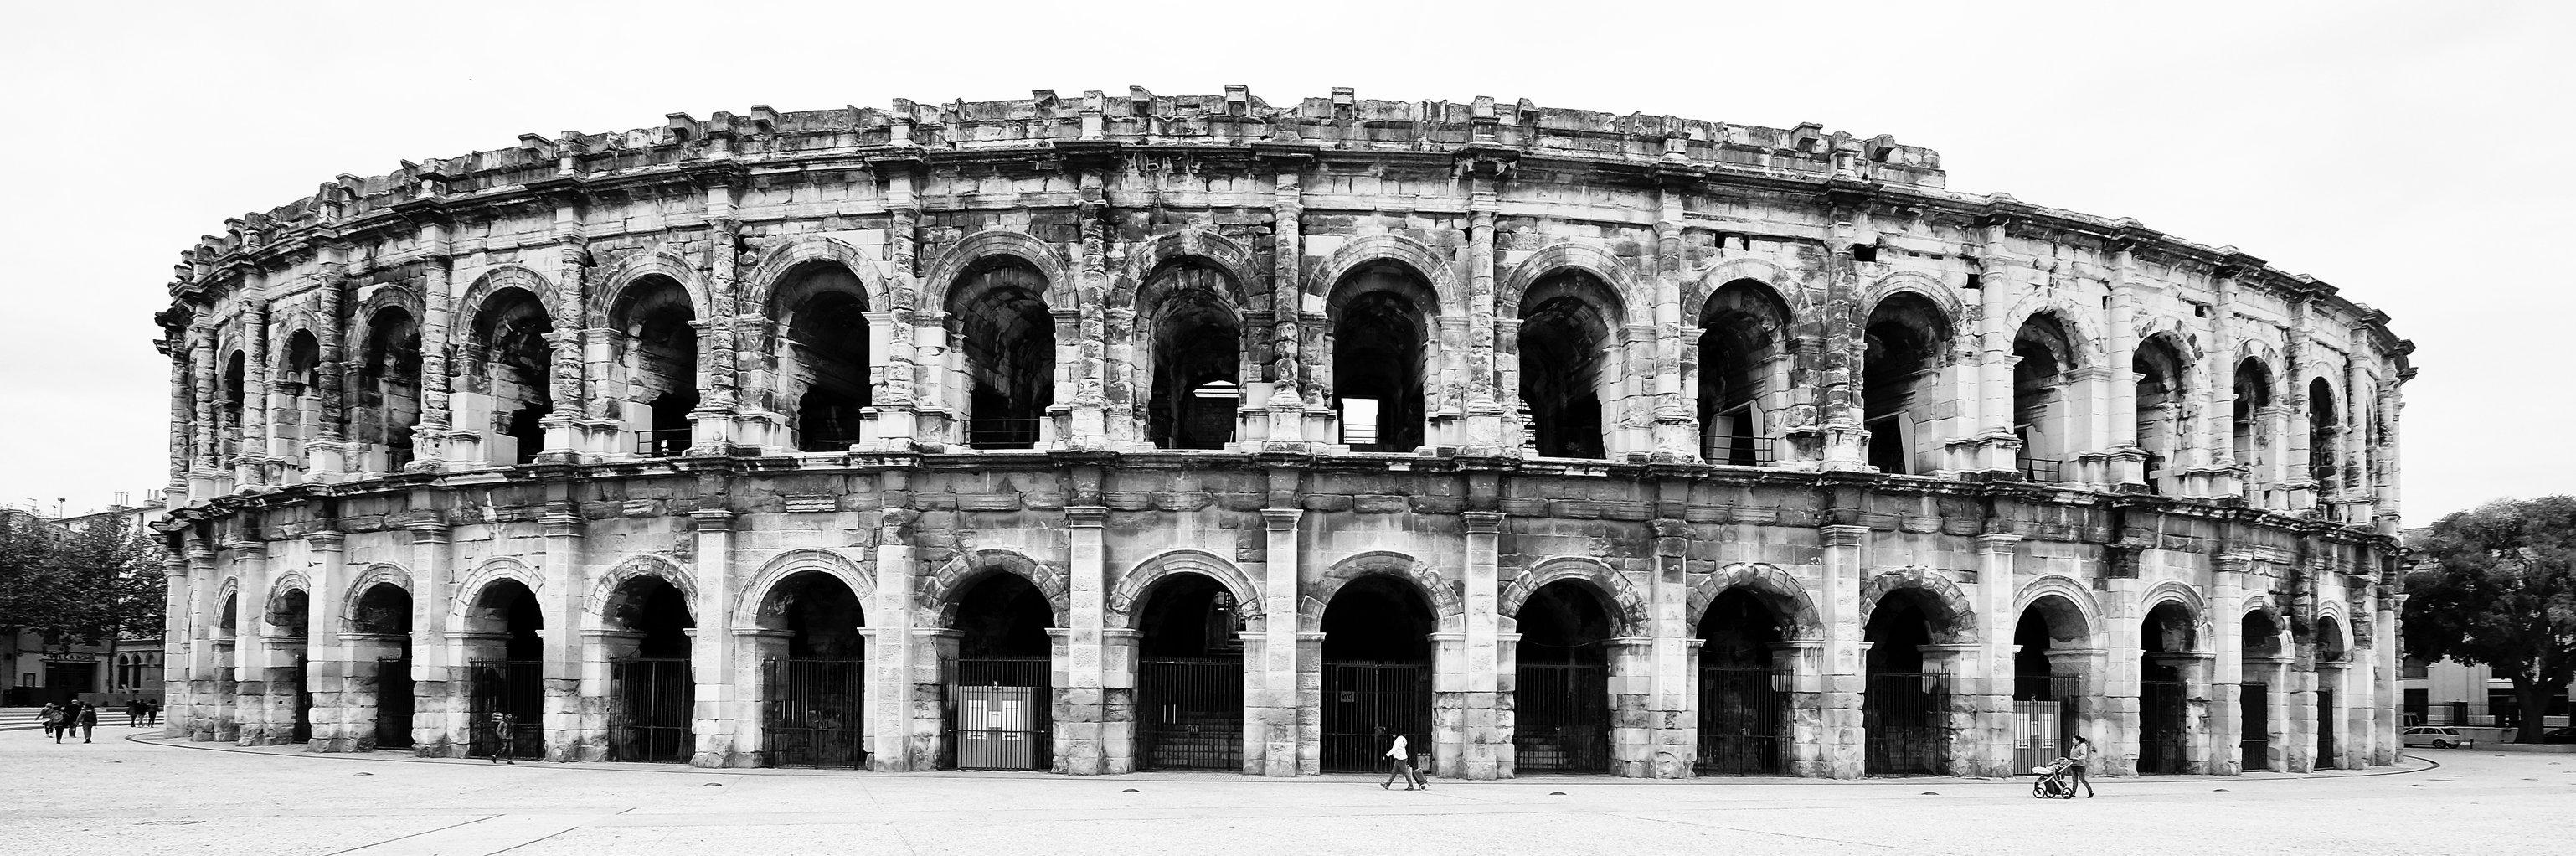 les arènes de Nîmes.jpg